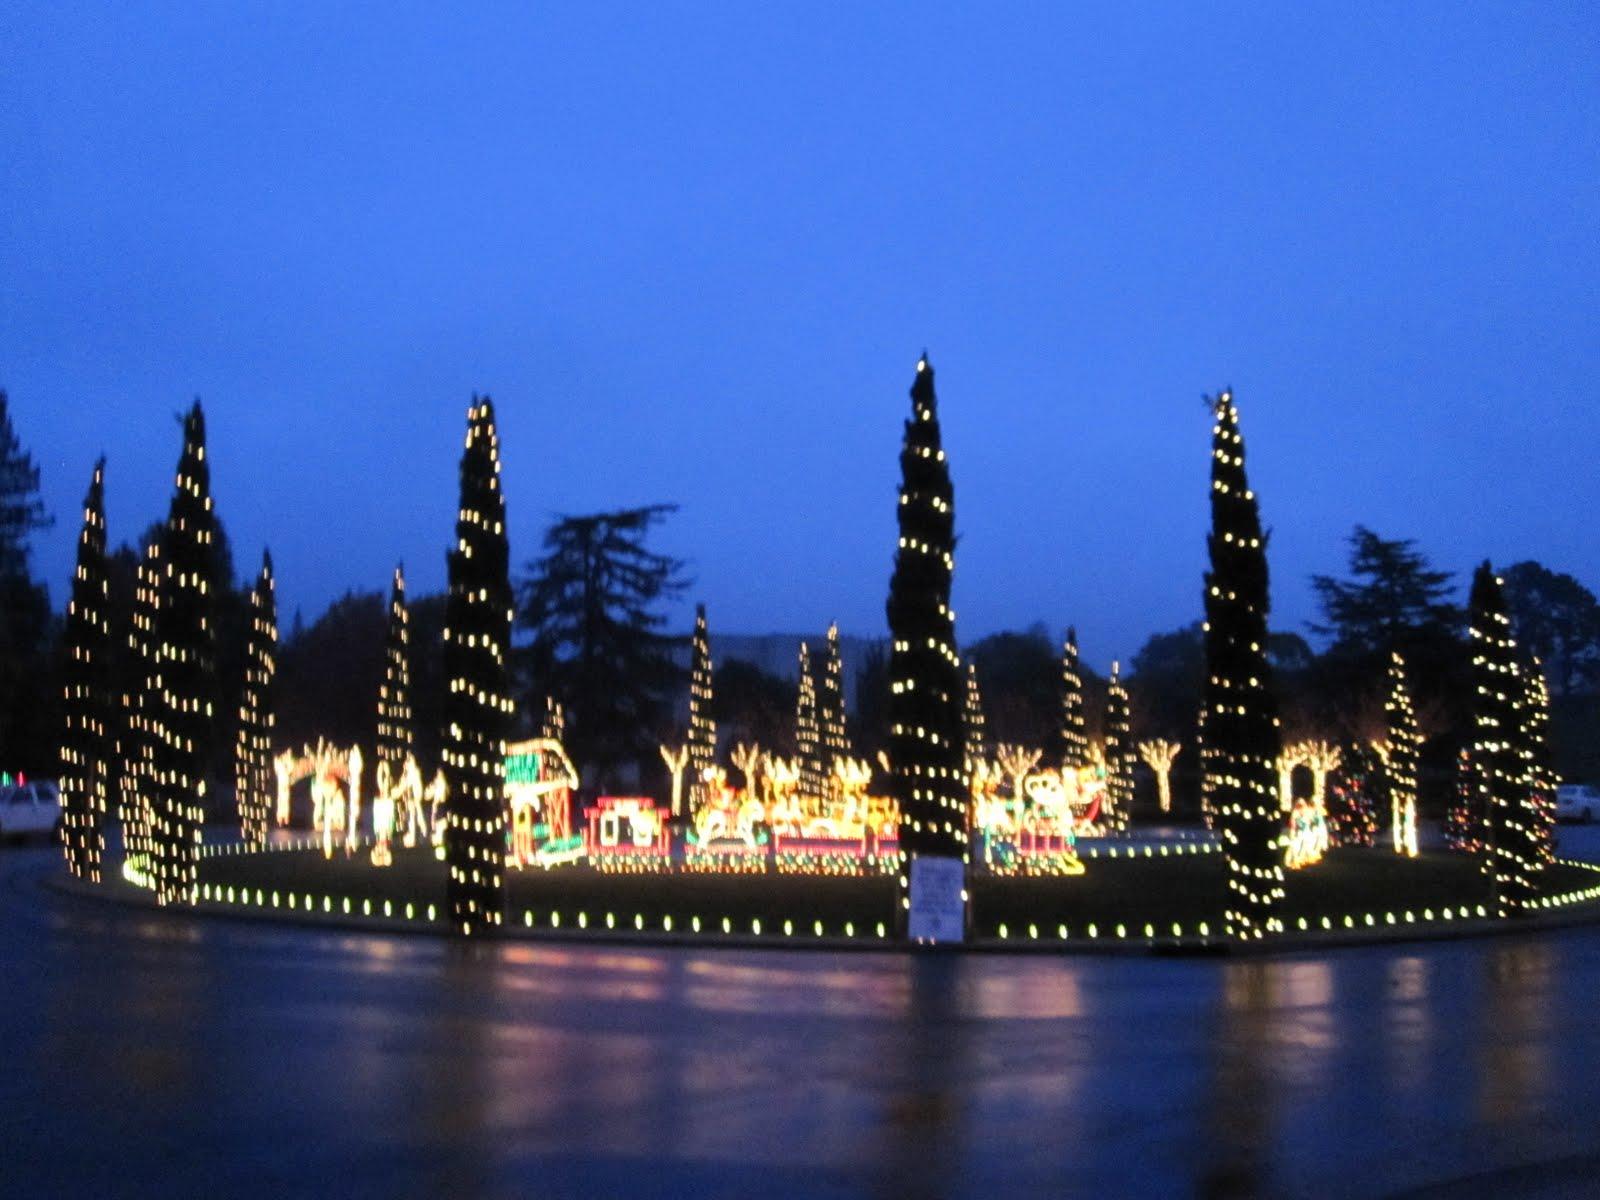 showbiz david my warmest christmas greetings to all holiday